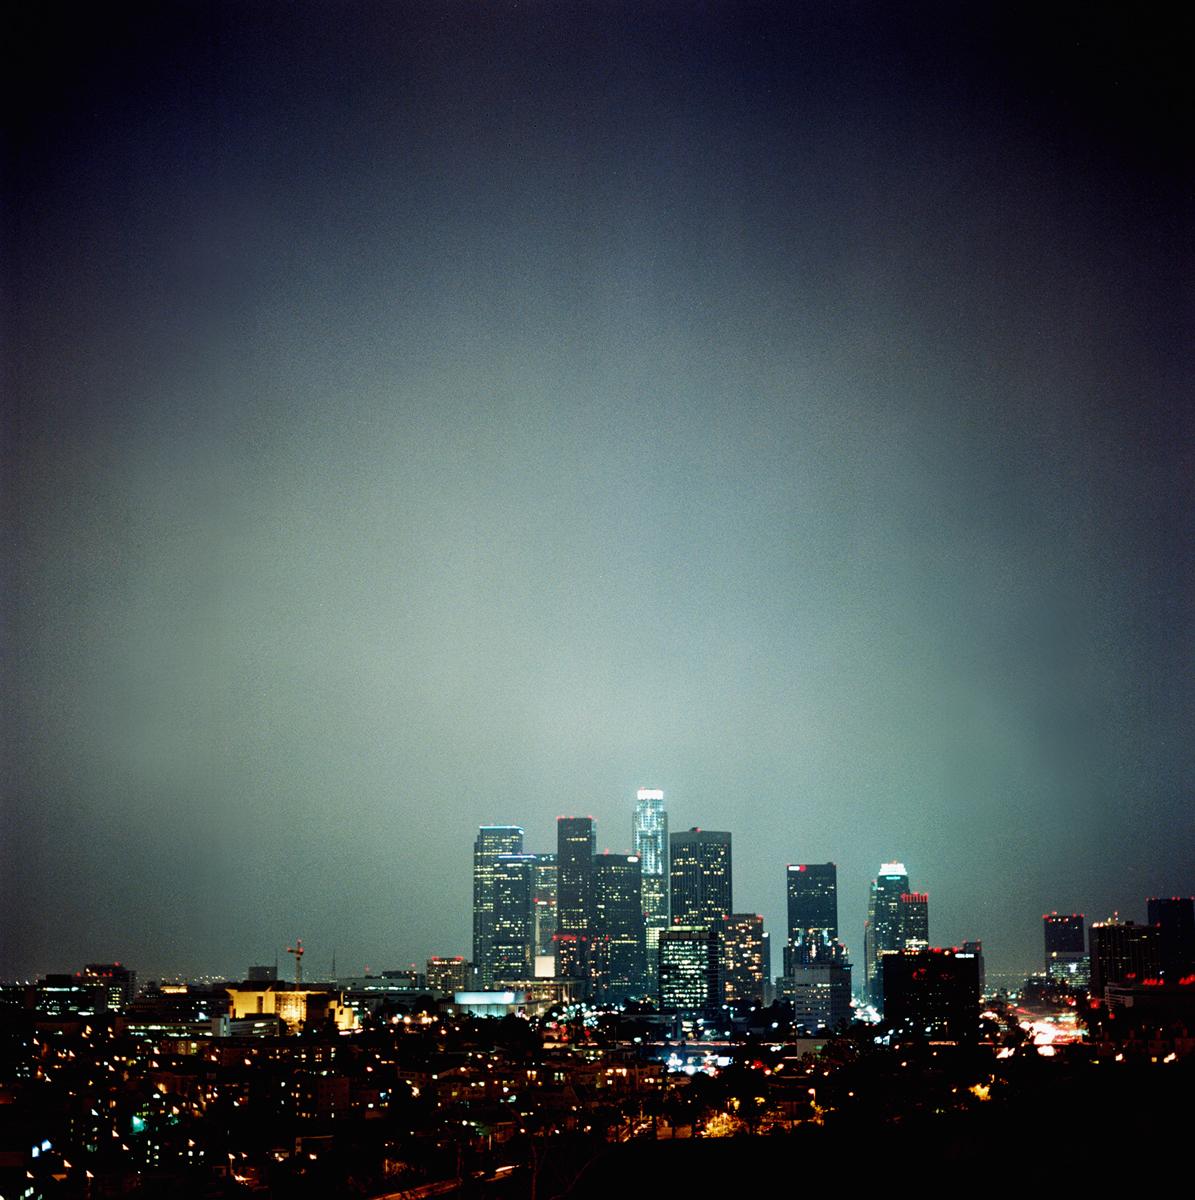 la.night.jpg